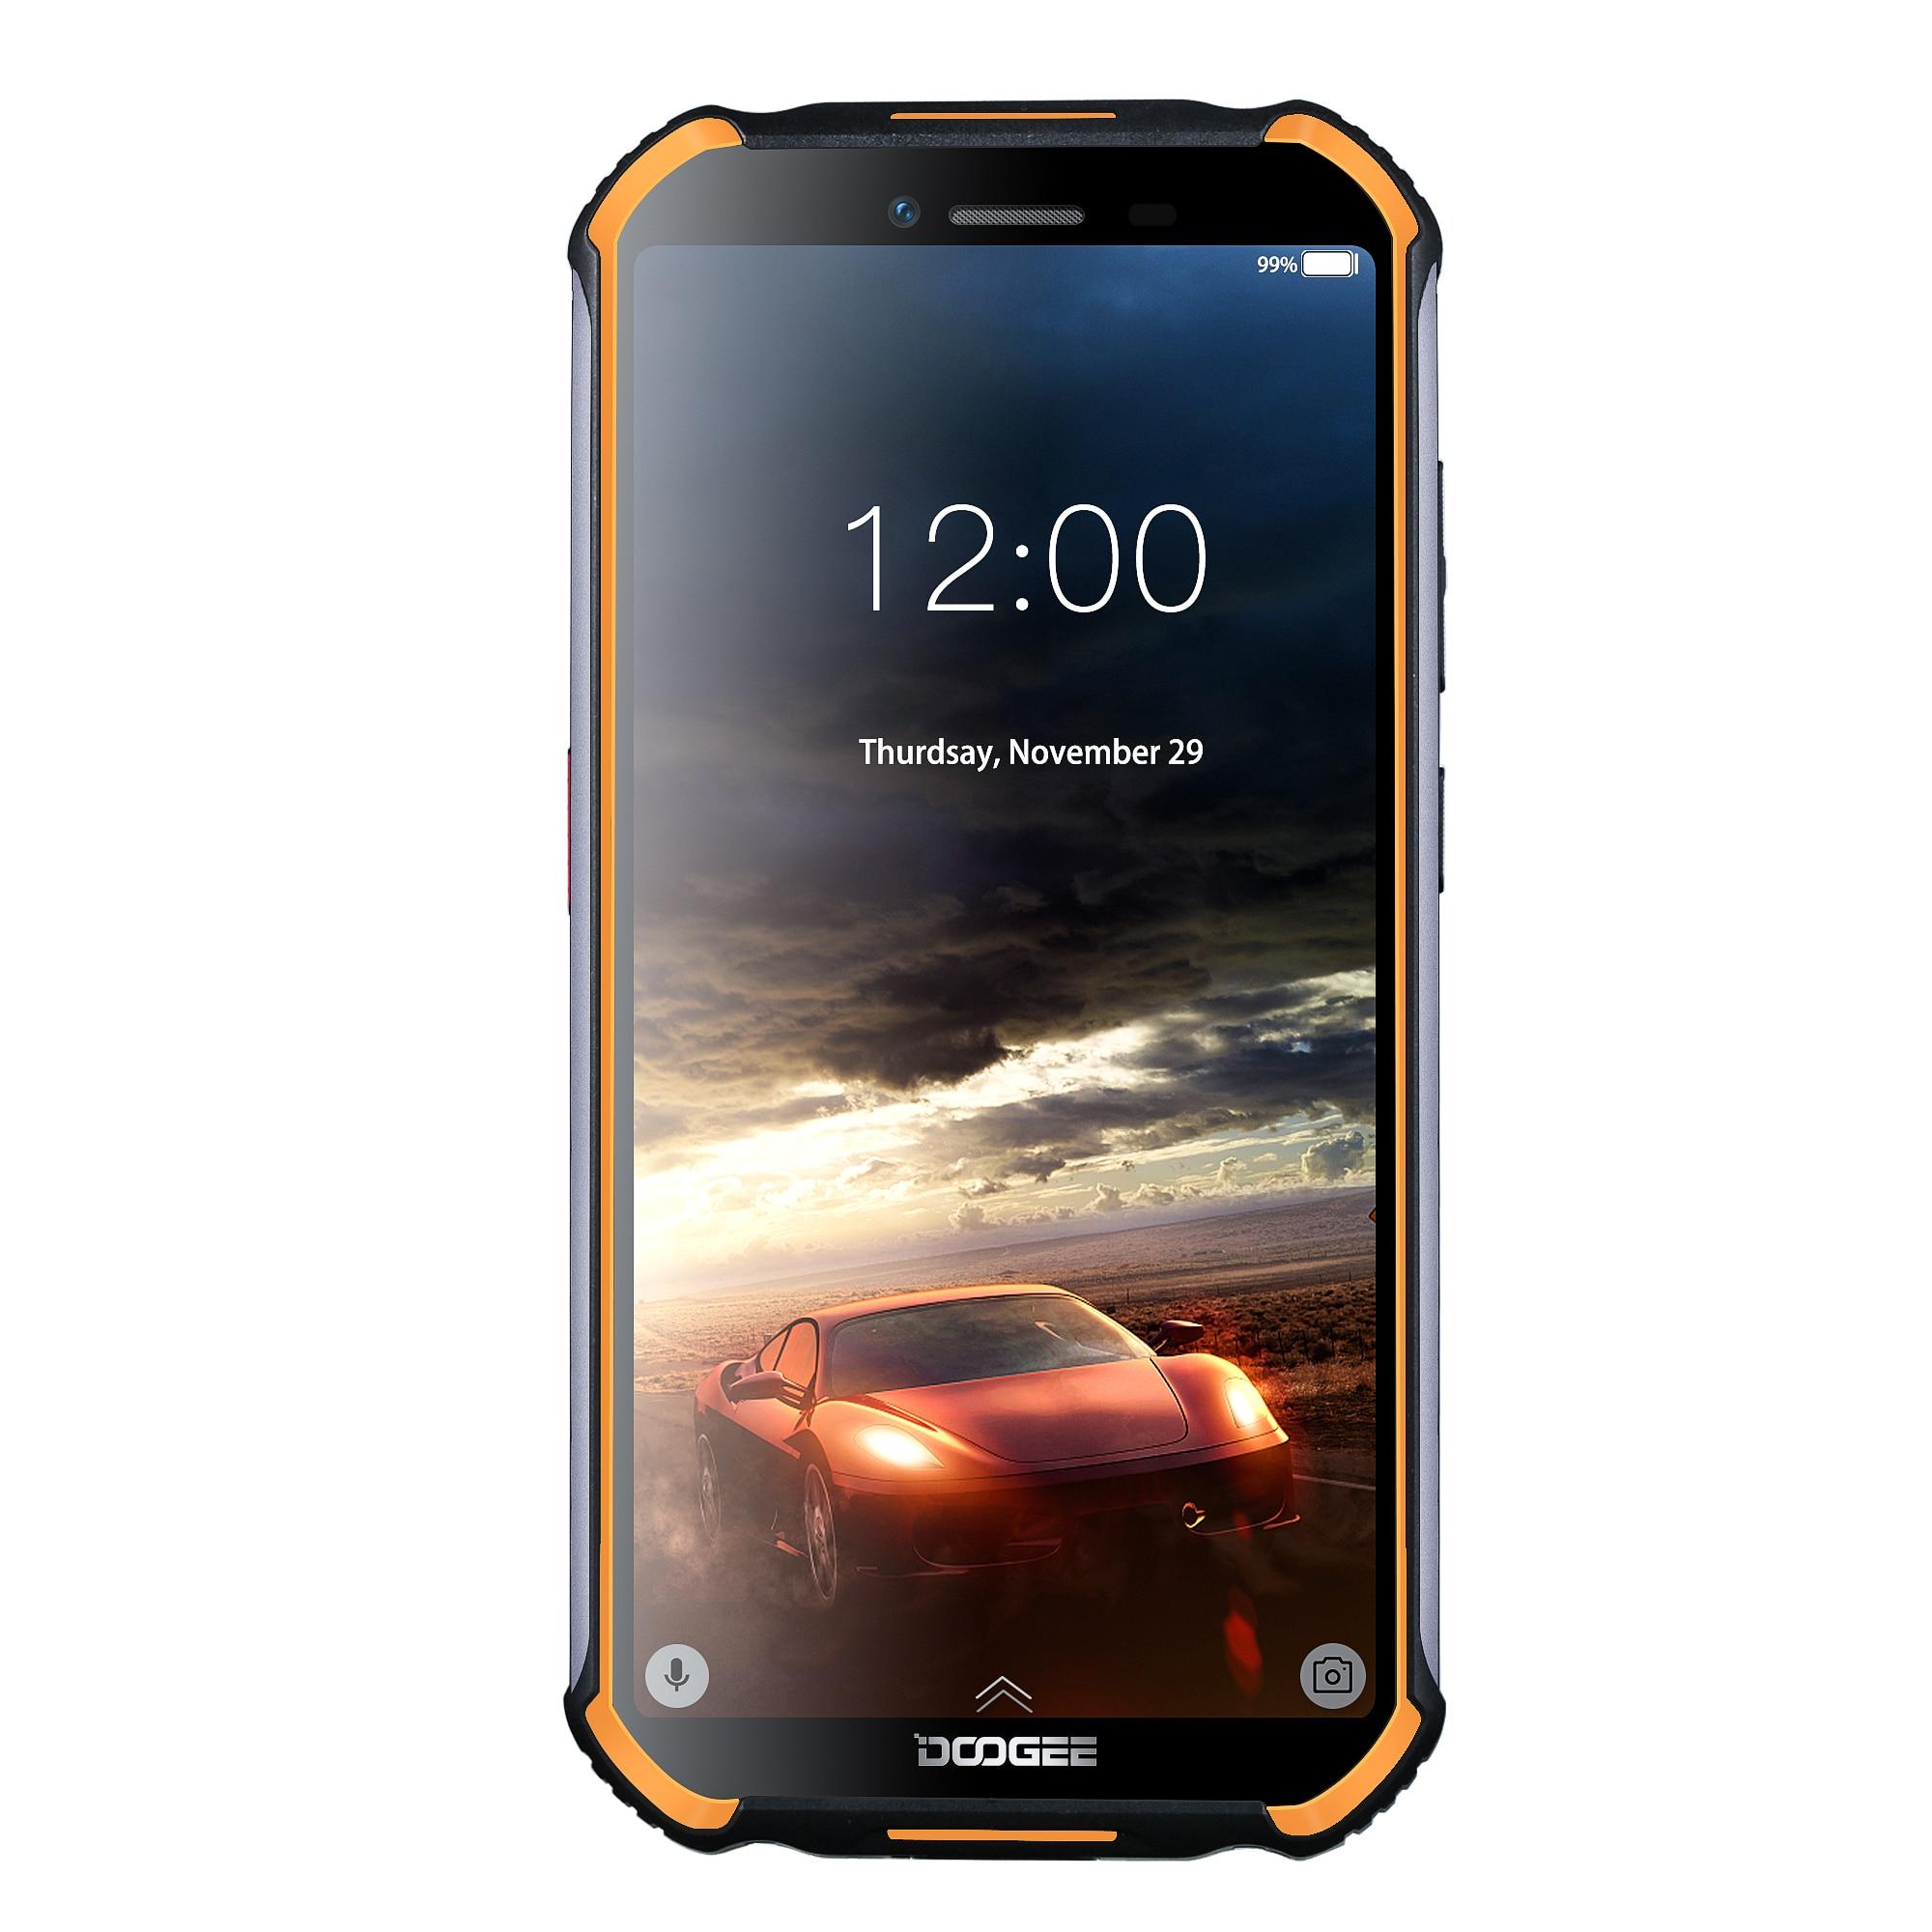 DOOGEE 4 S40 Android 9.0G Rede Móvel Robusto Telefone 5.5 de polegada de Telefone Celular MT6739 Quad Core 3GB de RAM GB ROM 8.0MP 32 IP68/IP69K